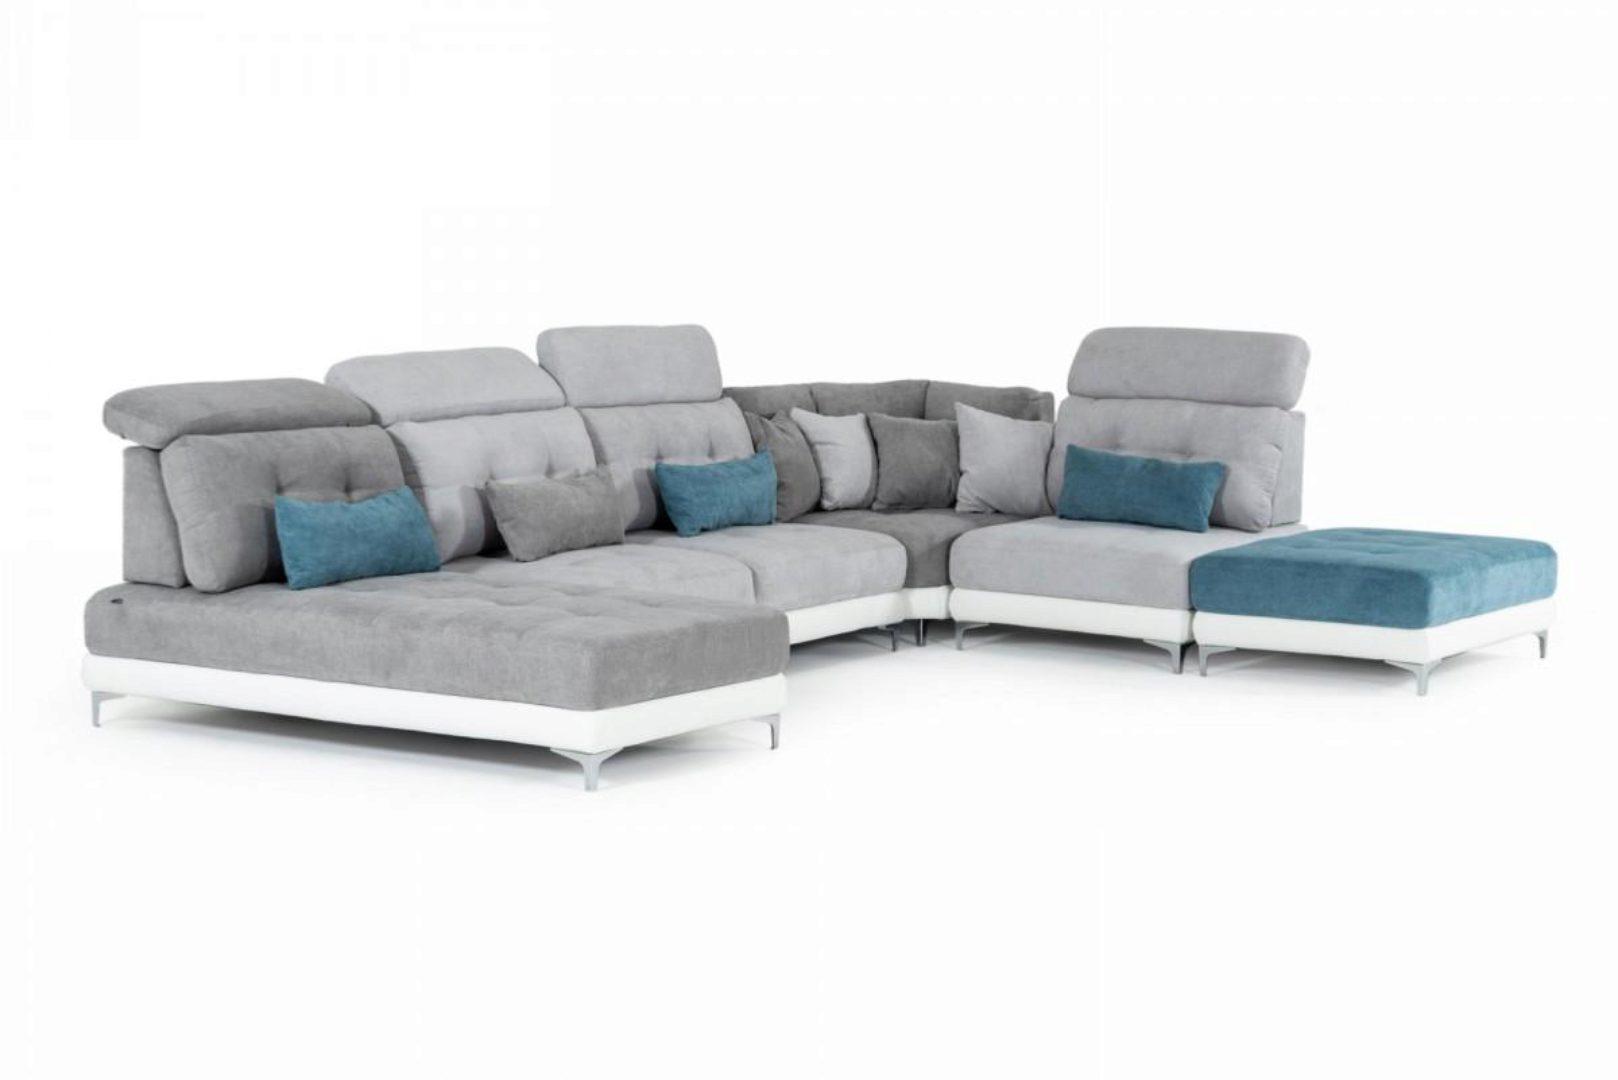 sectional sofa 4pcs ottoman multi color fabric modern made in italy vig david ferrari jive